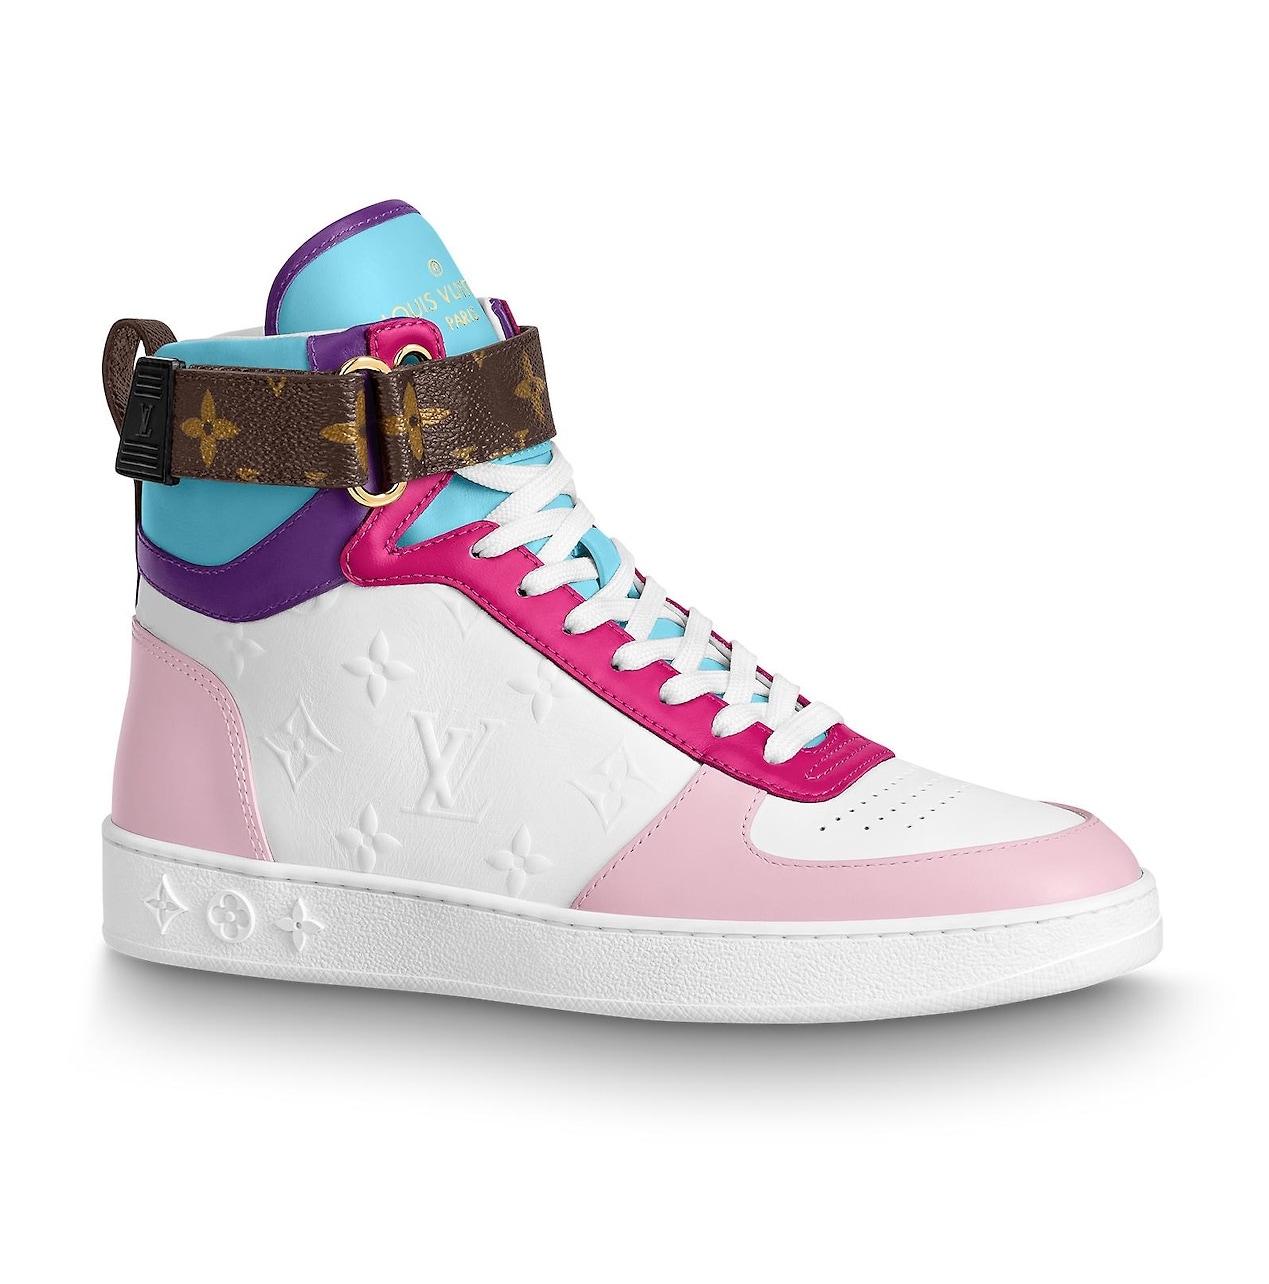 Louis Vuitton Boombox Sneaker